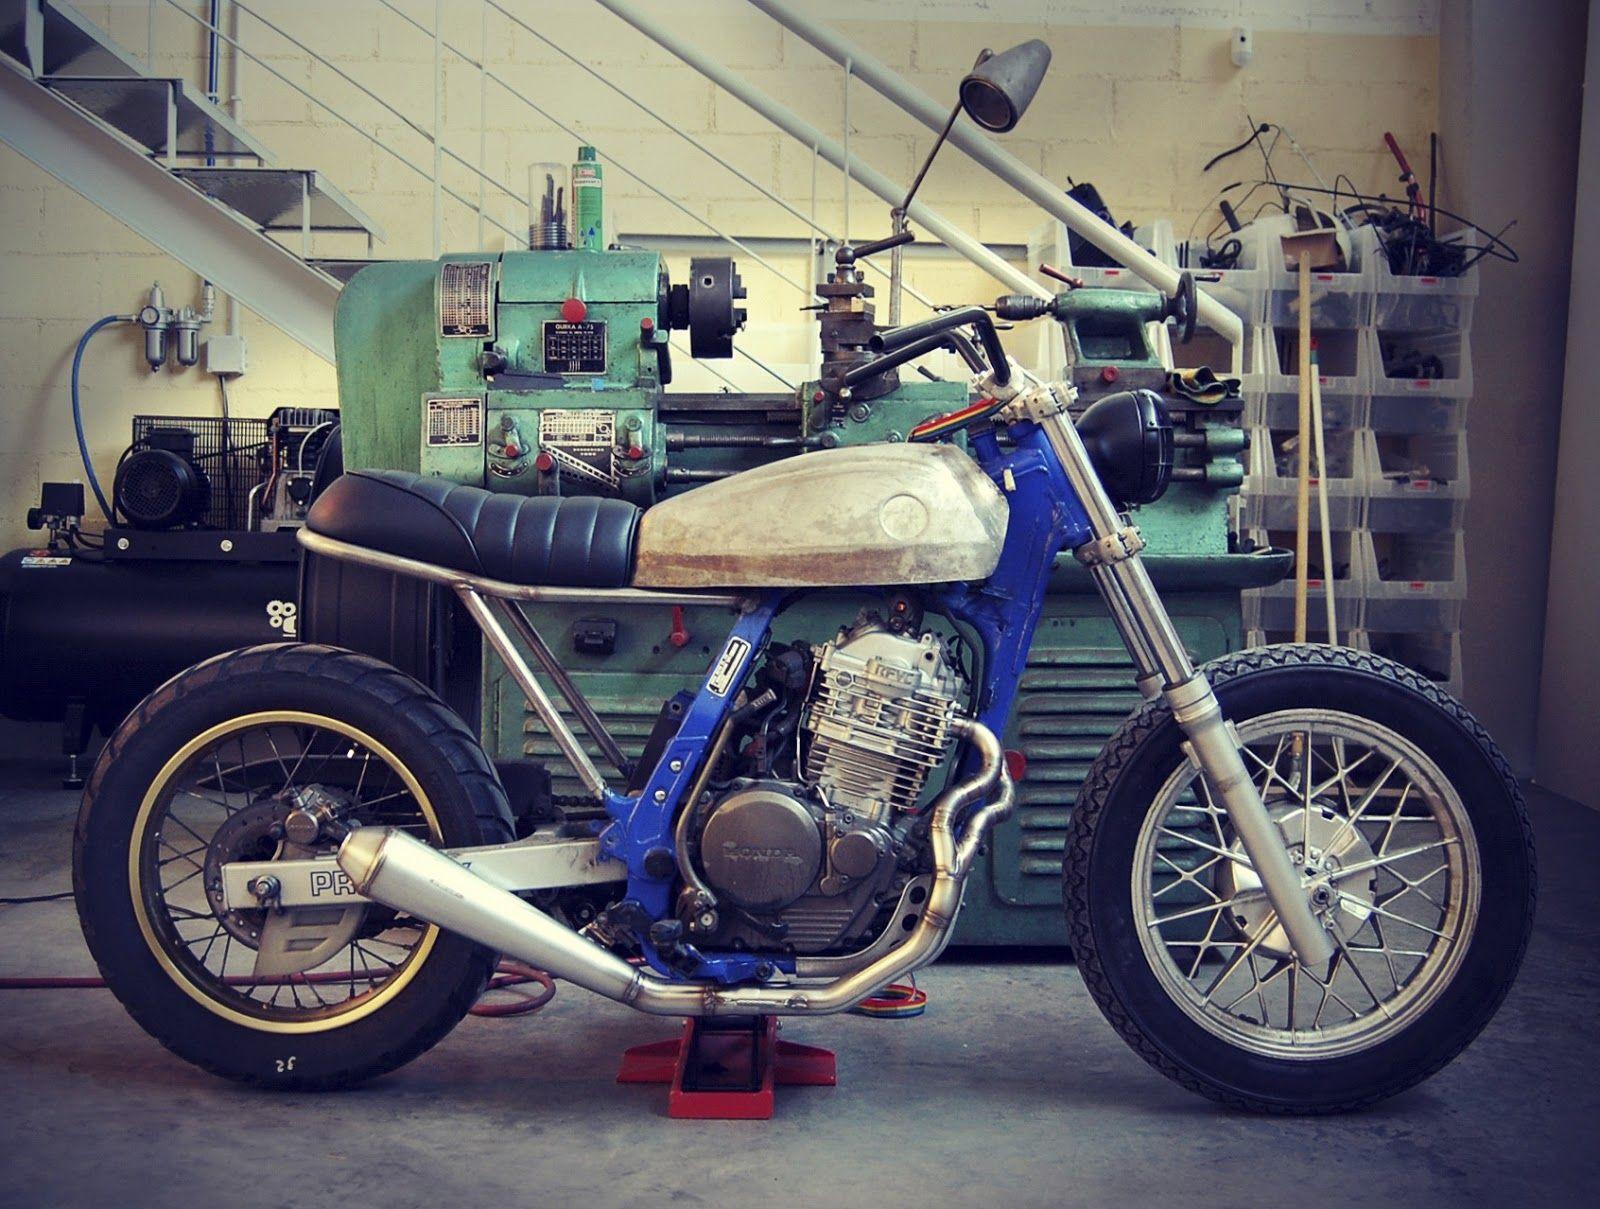 149 best scrambler images on pinterest | scrambler, custom bikes